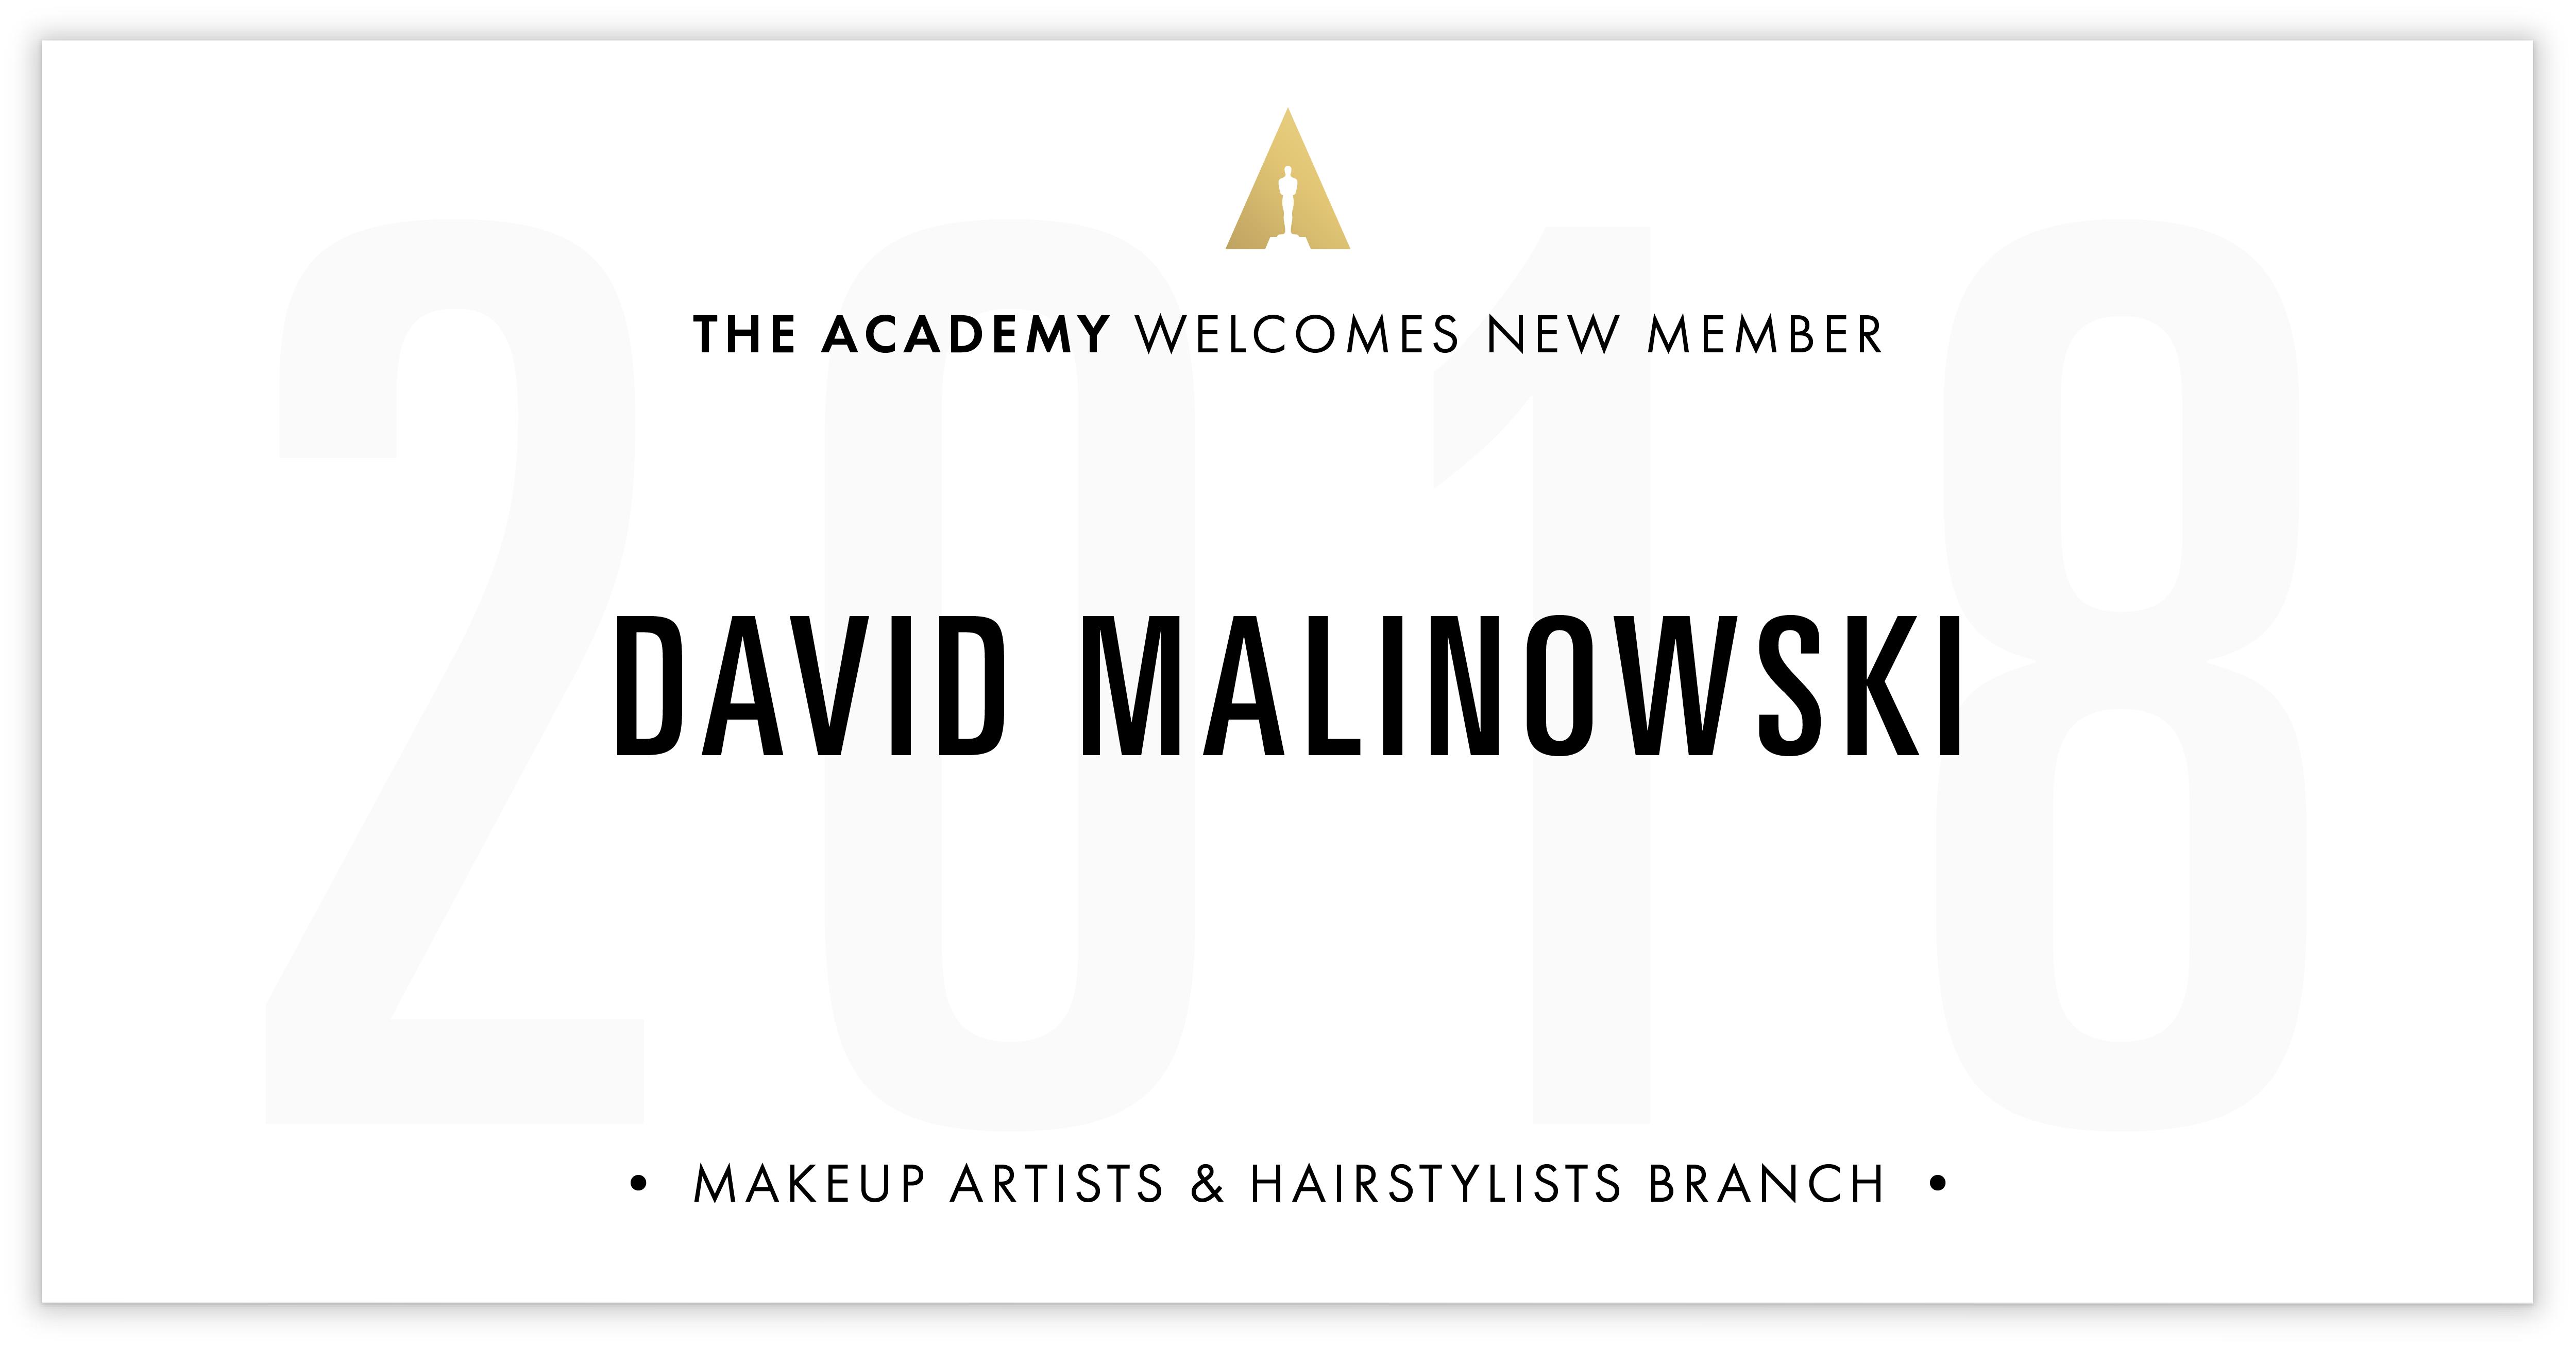 David Malinowski is invited!